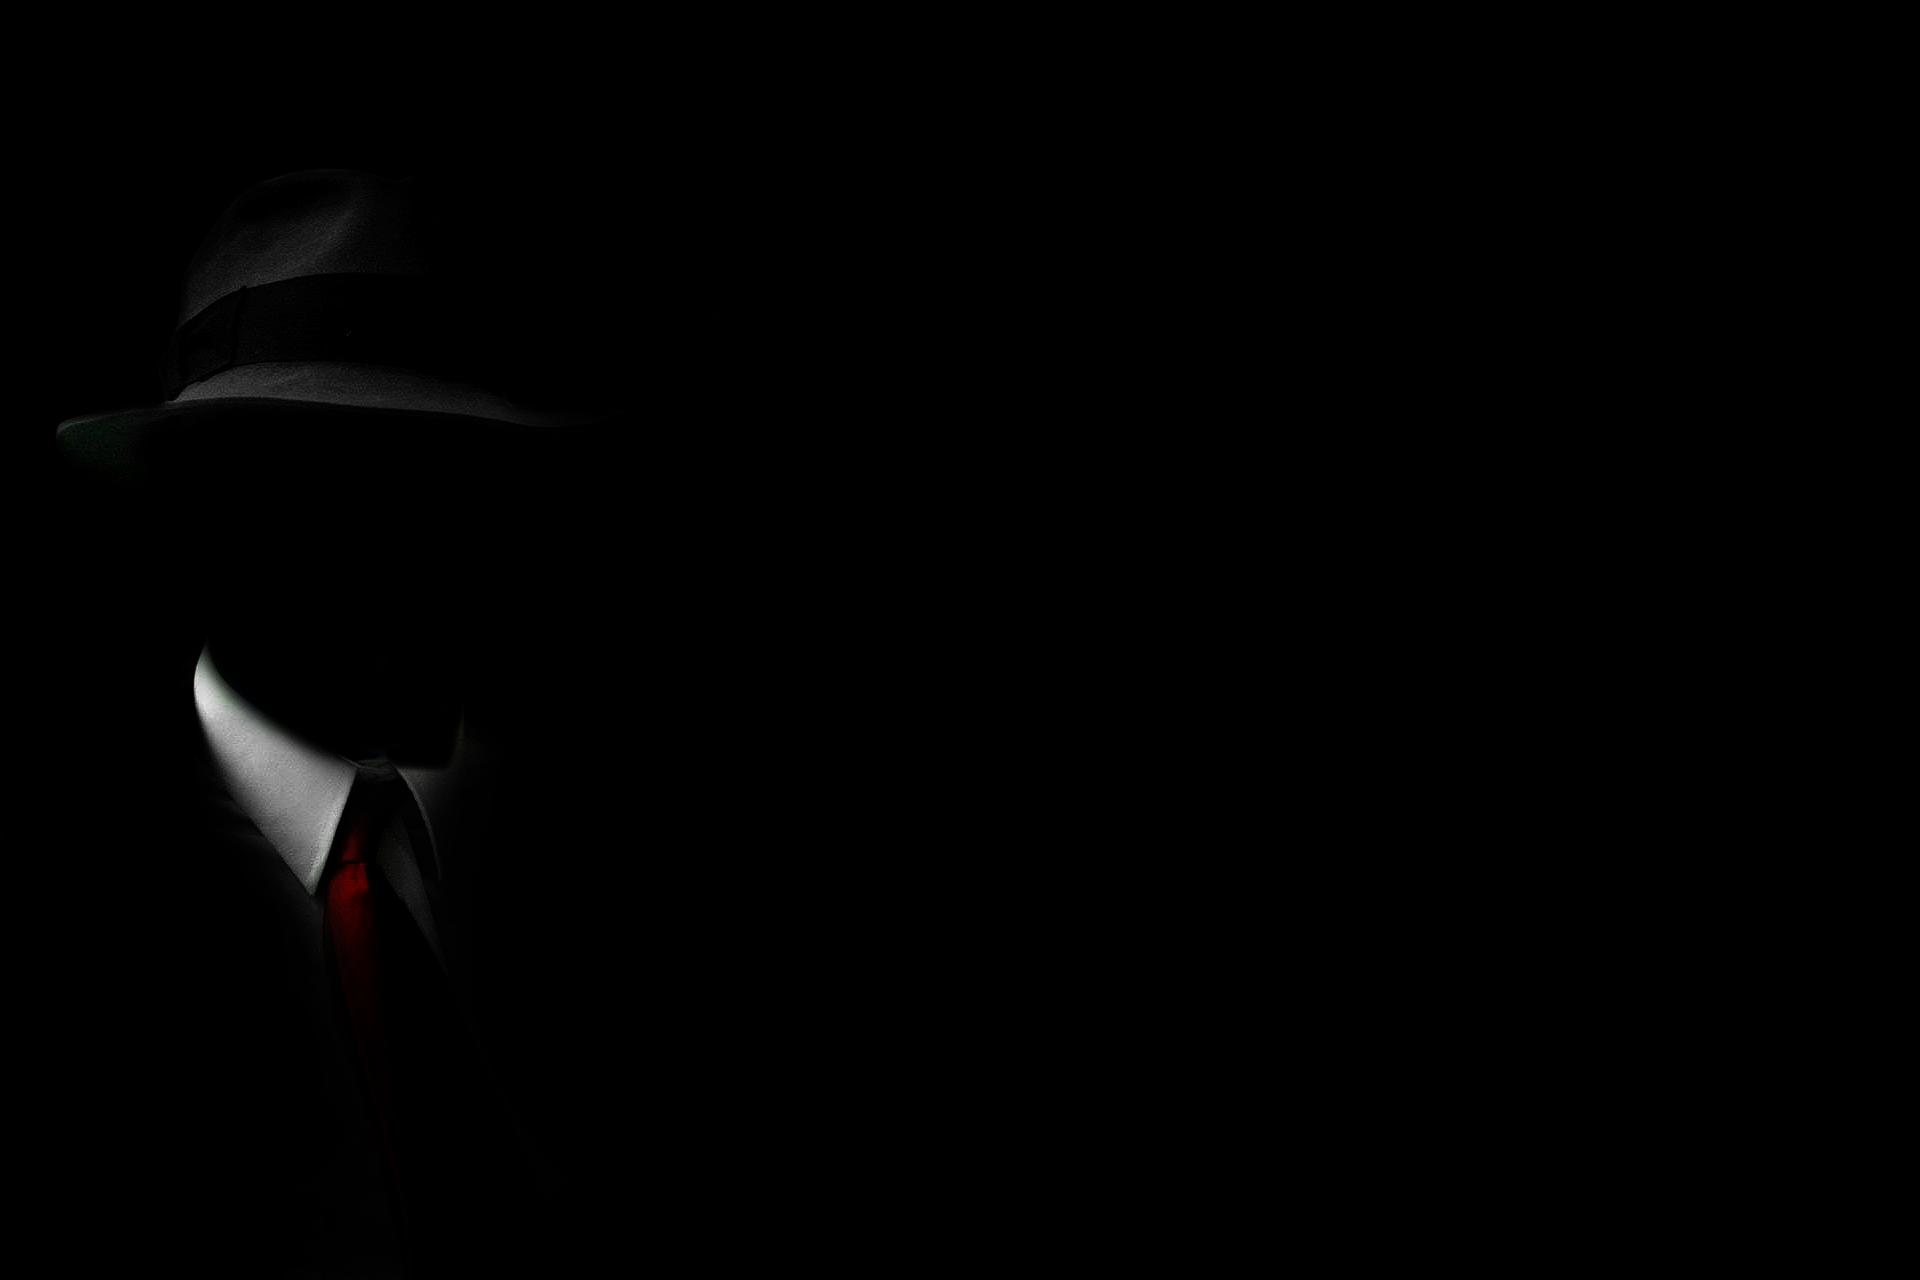 49+ Anonymous Desktop Wallpapers on WallpaperSafari